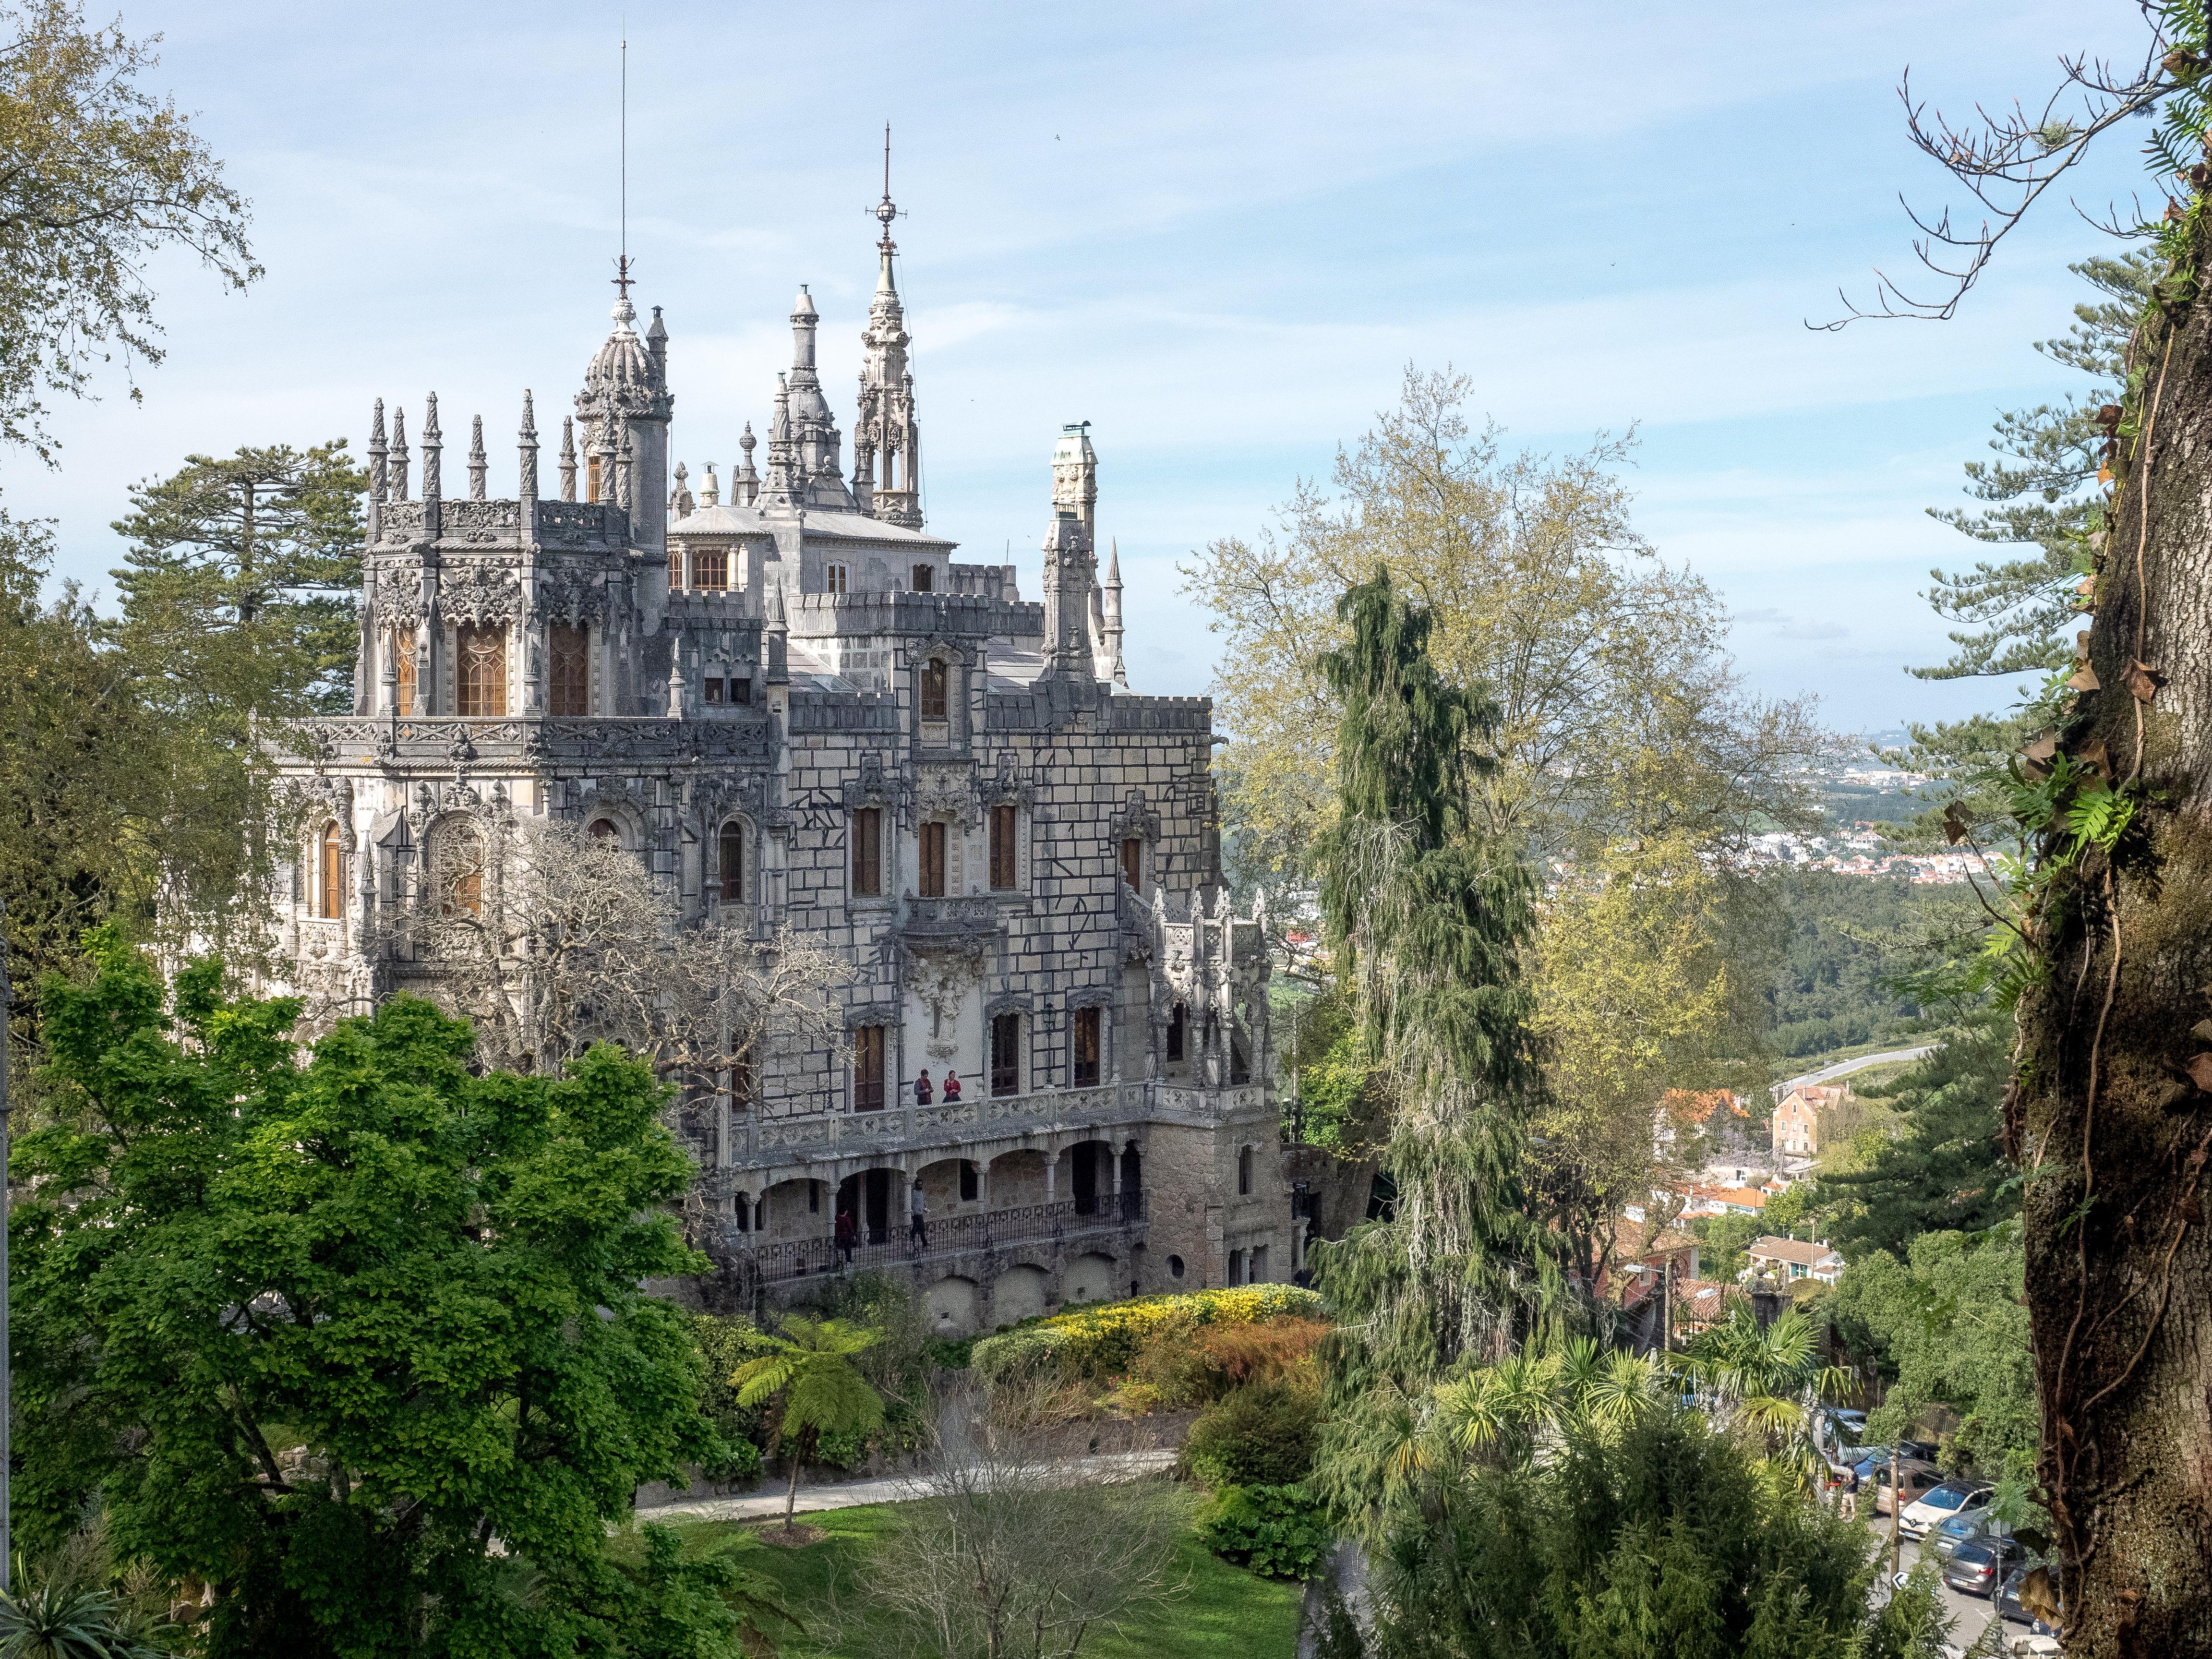 Quinta da Regaleira - Wikipedia